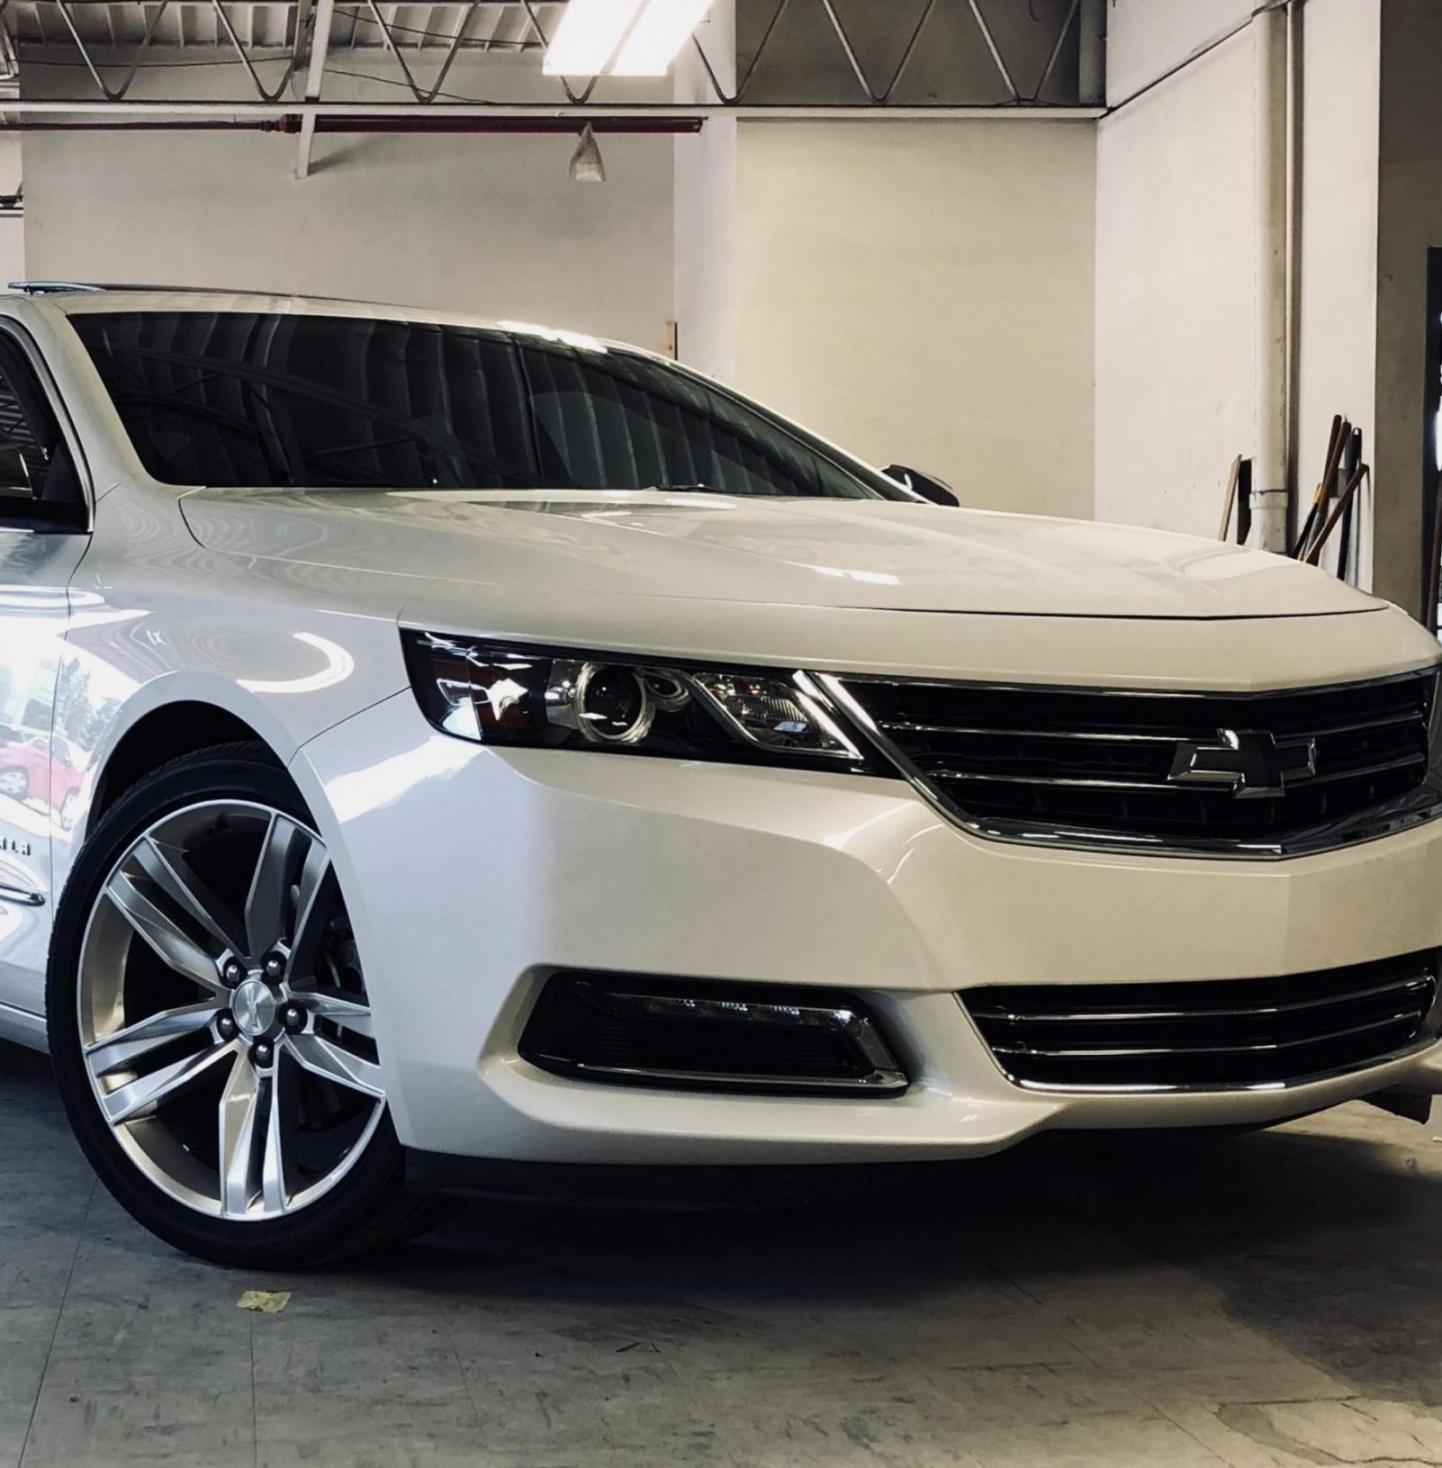 Hello Epsilon II- 2014 Impala LTZ-3ef6636e-32d7-405e-8c6a-14e79166969c_1528041127571.jpeg